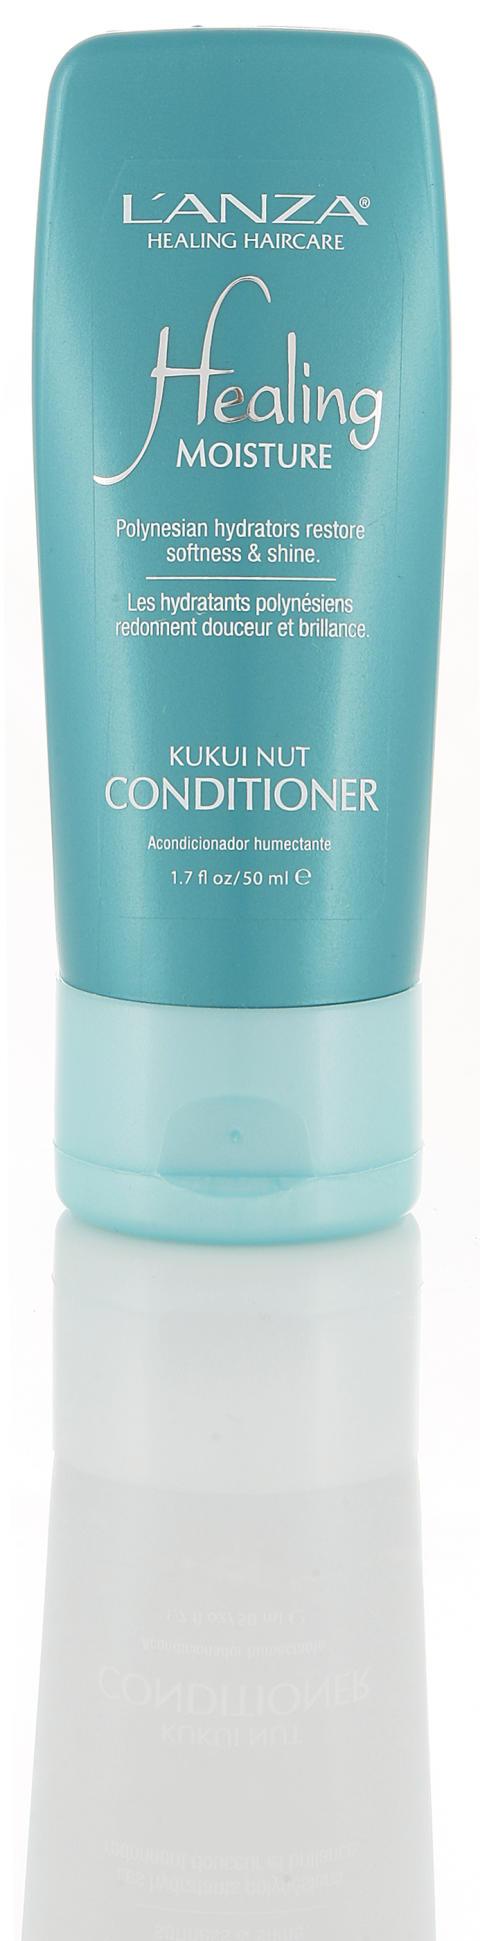 L´anza Healing Moisture Conditioner 50ml